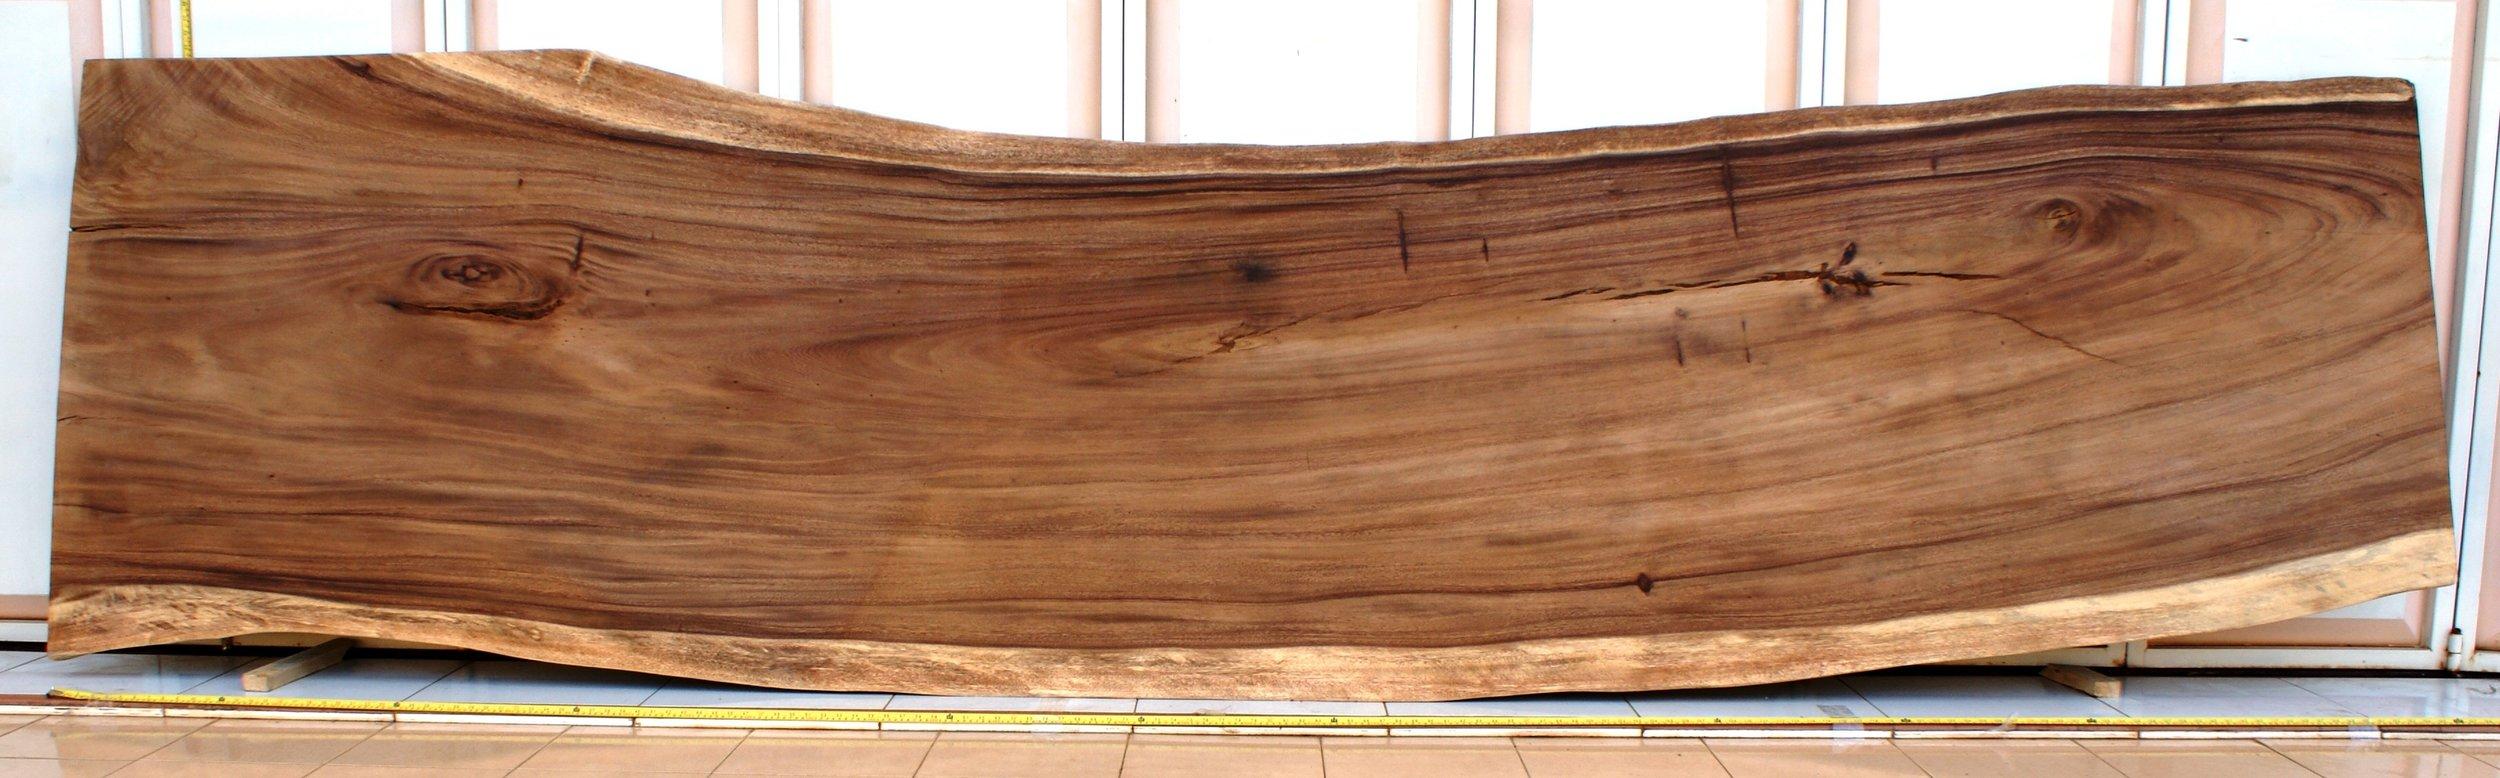 SUAR  Материал: слэб дерева  суар  Размеры: 400 x 85-105 х 10 см